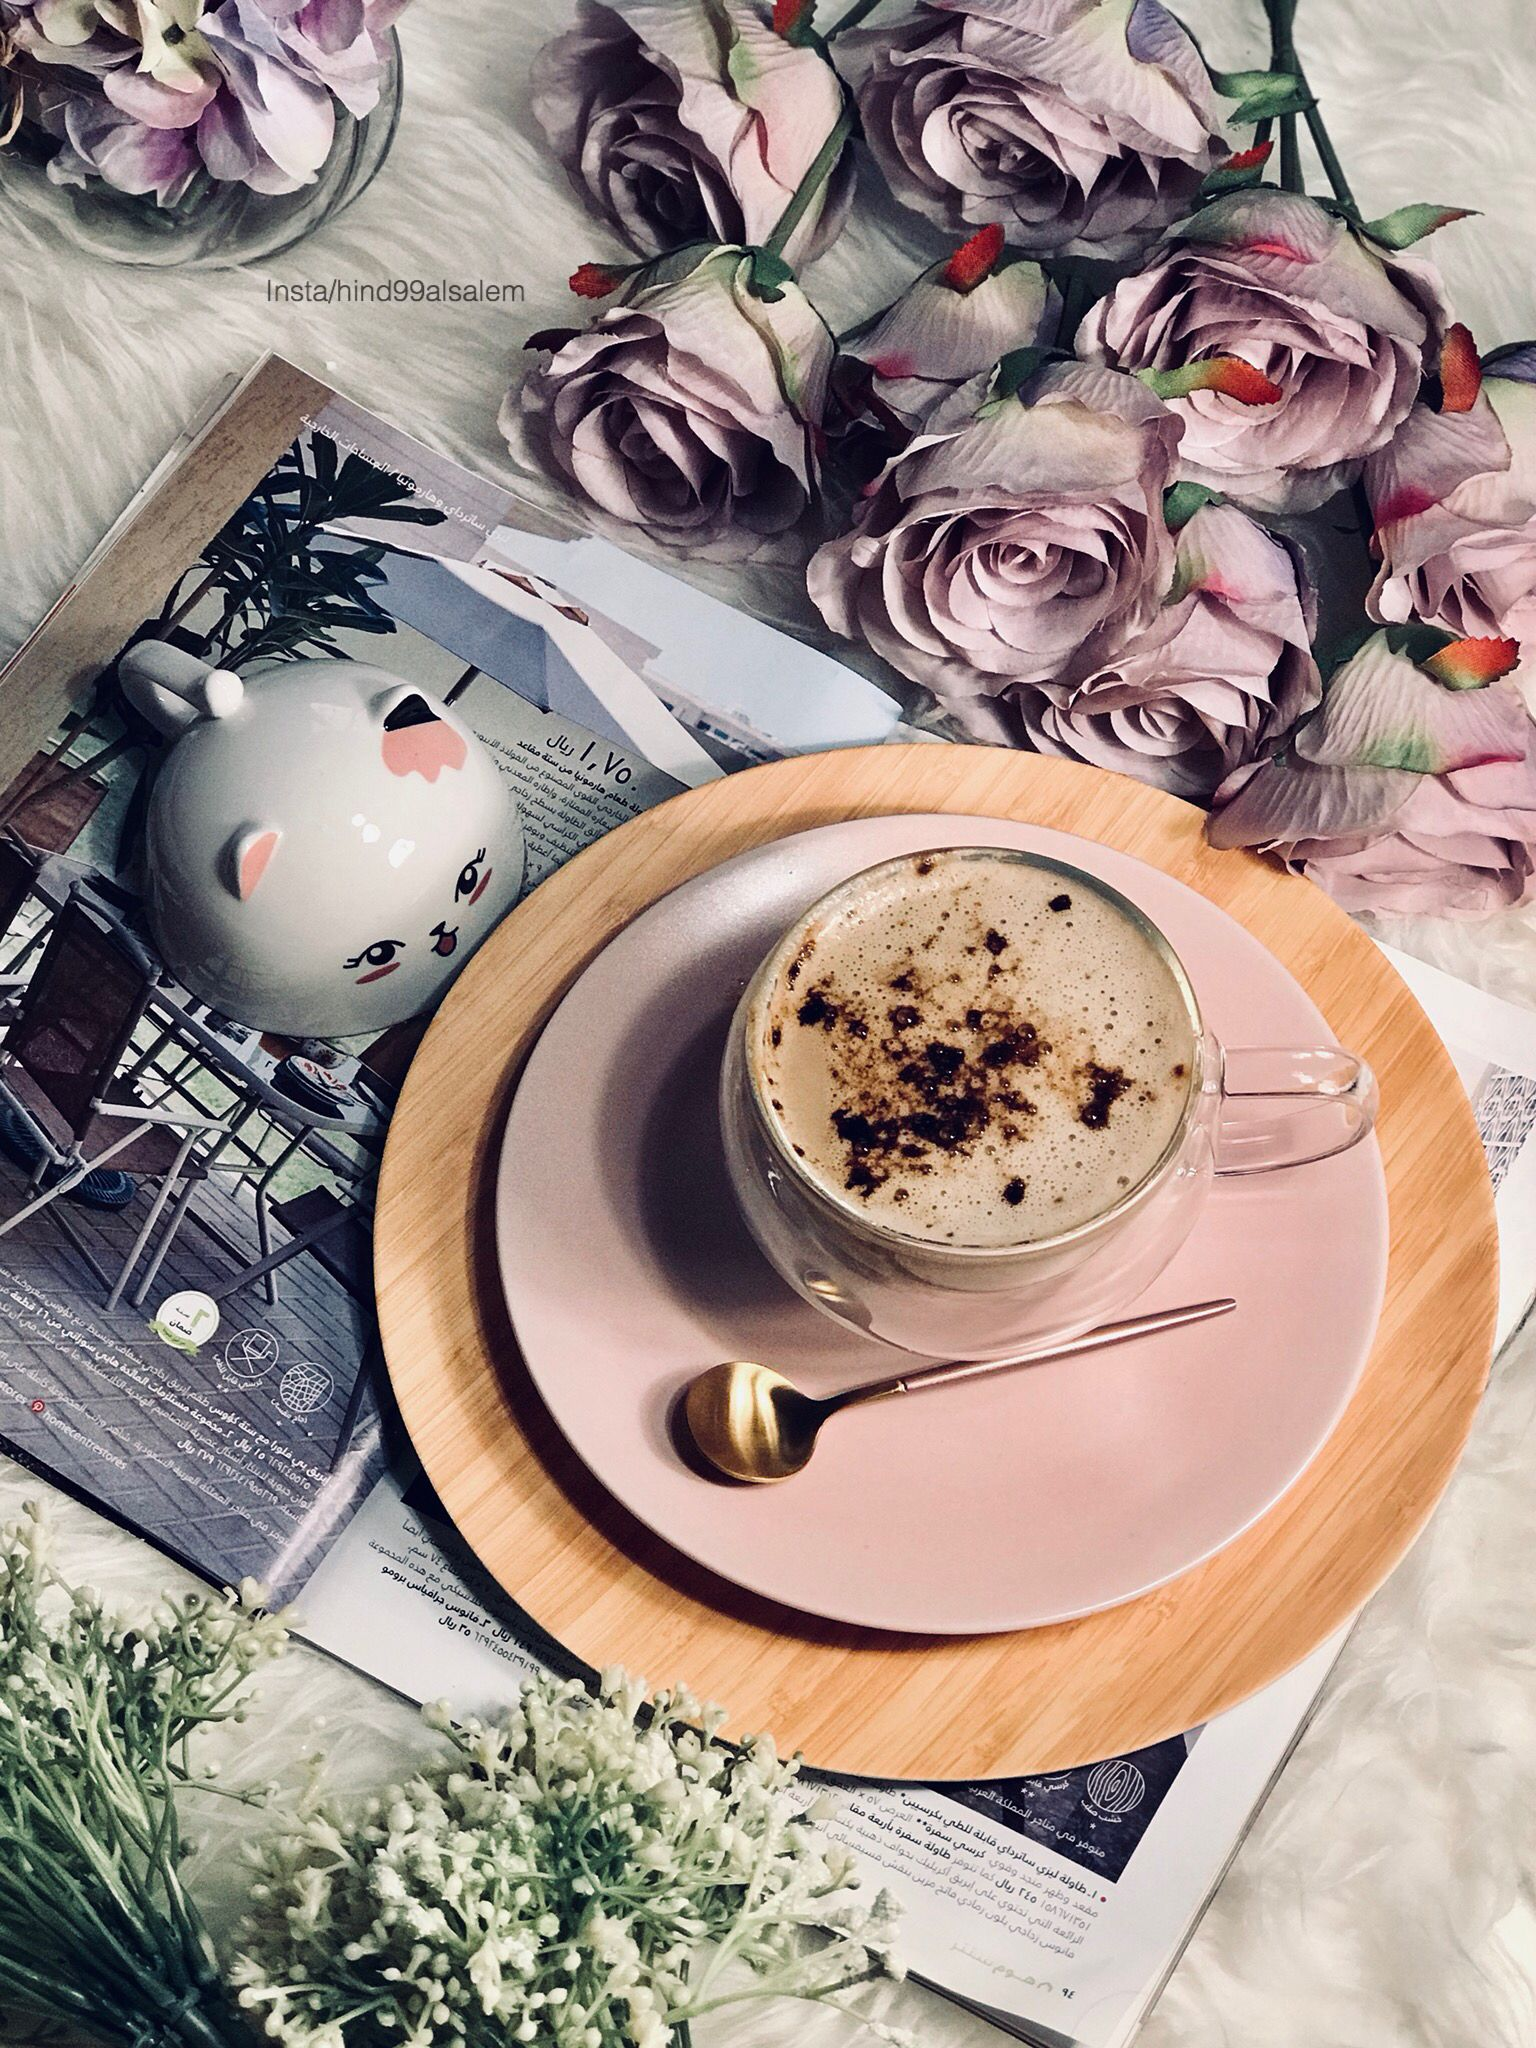 دعاء صورة افكار تصوير احترافيه Coffee Coffeetime قهوه كوفي تكوين عدسه سناب Pictures كلام كلمات حب عشق Coffee Cafe Coffee Latte Diy Home Crafts